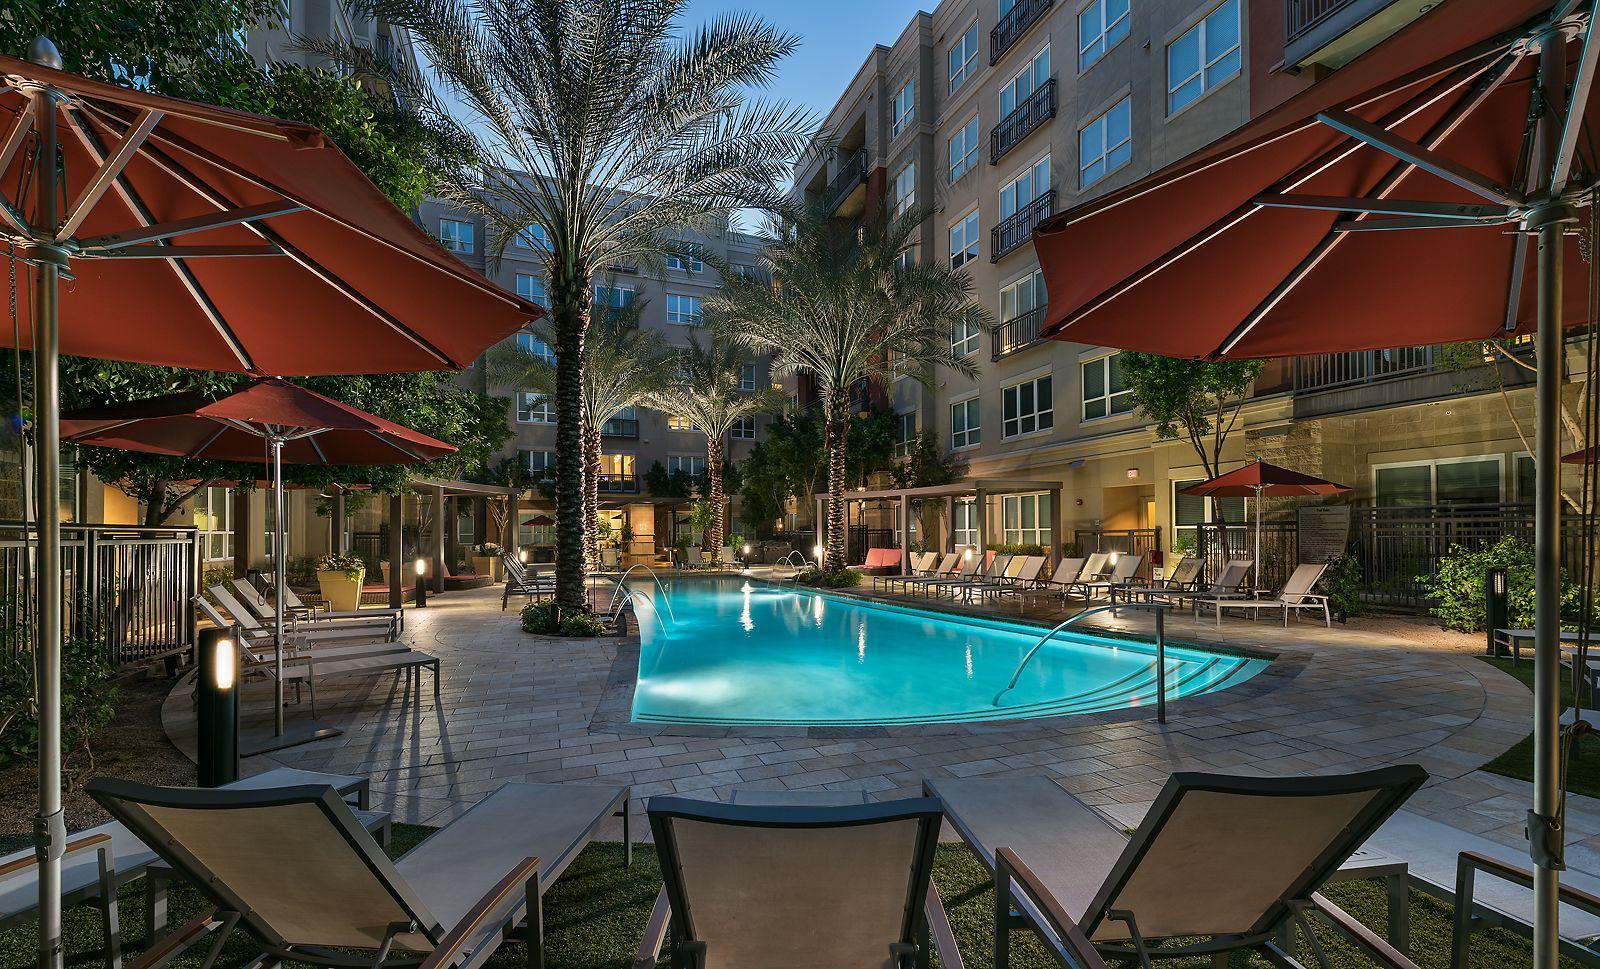 Heated Pool Emerson Mill Avenue Apartments Arizona